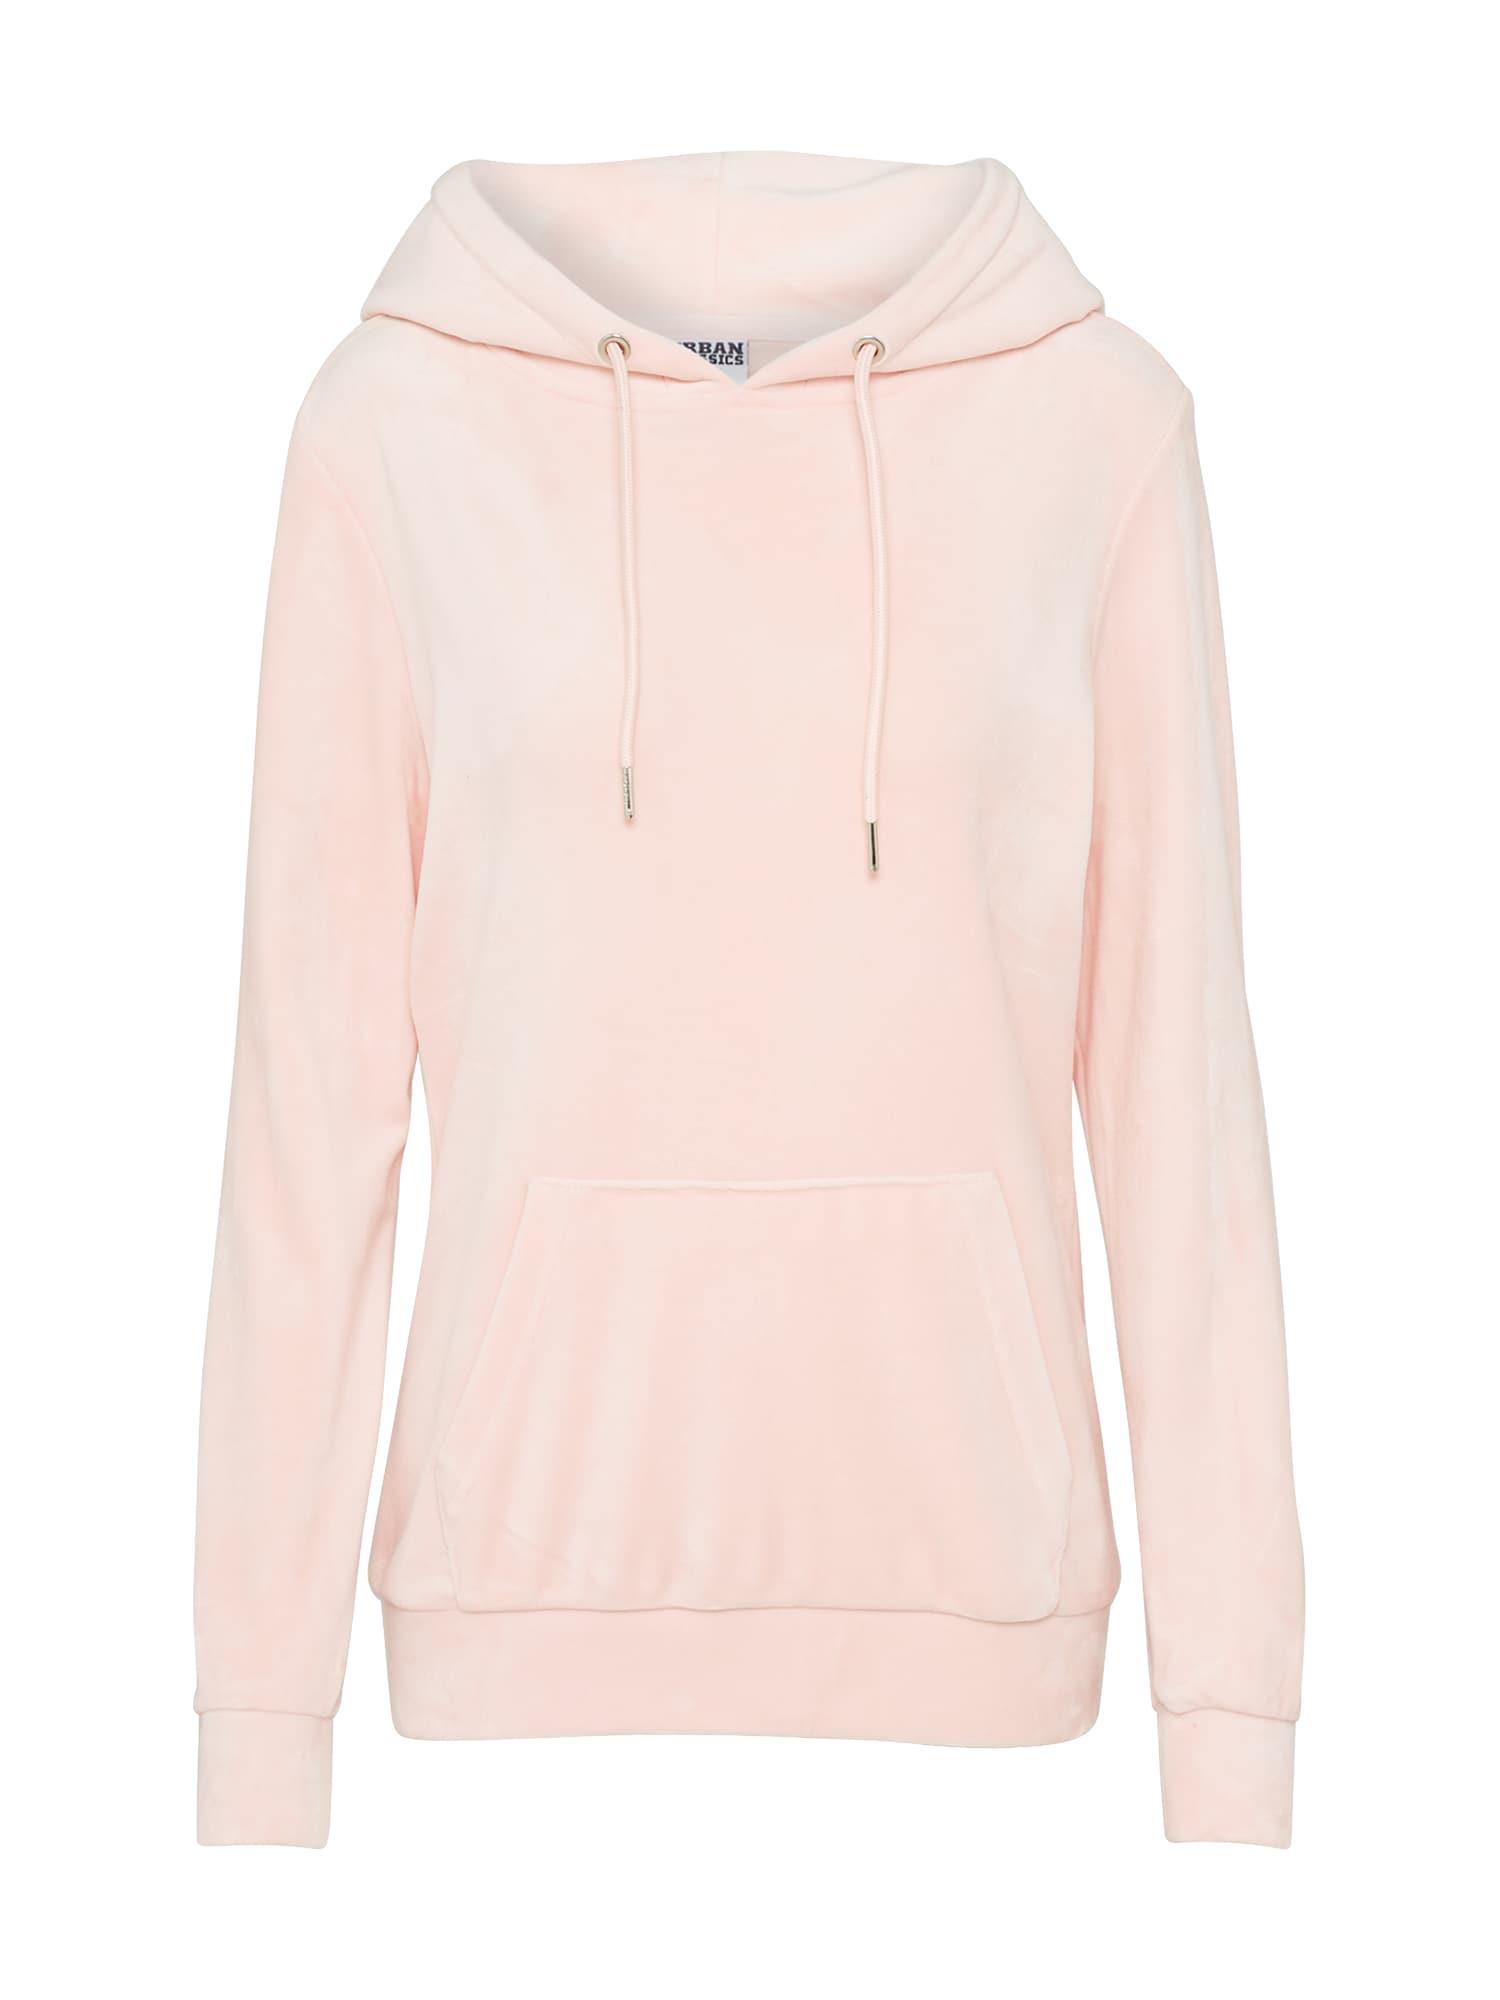 Hoody | Bekleidung > Sweatshirts & -jacken | Urban Classics